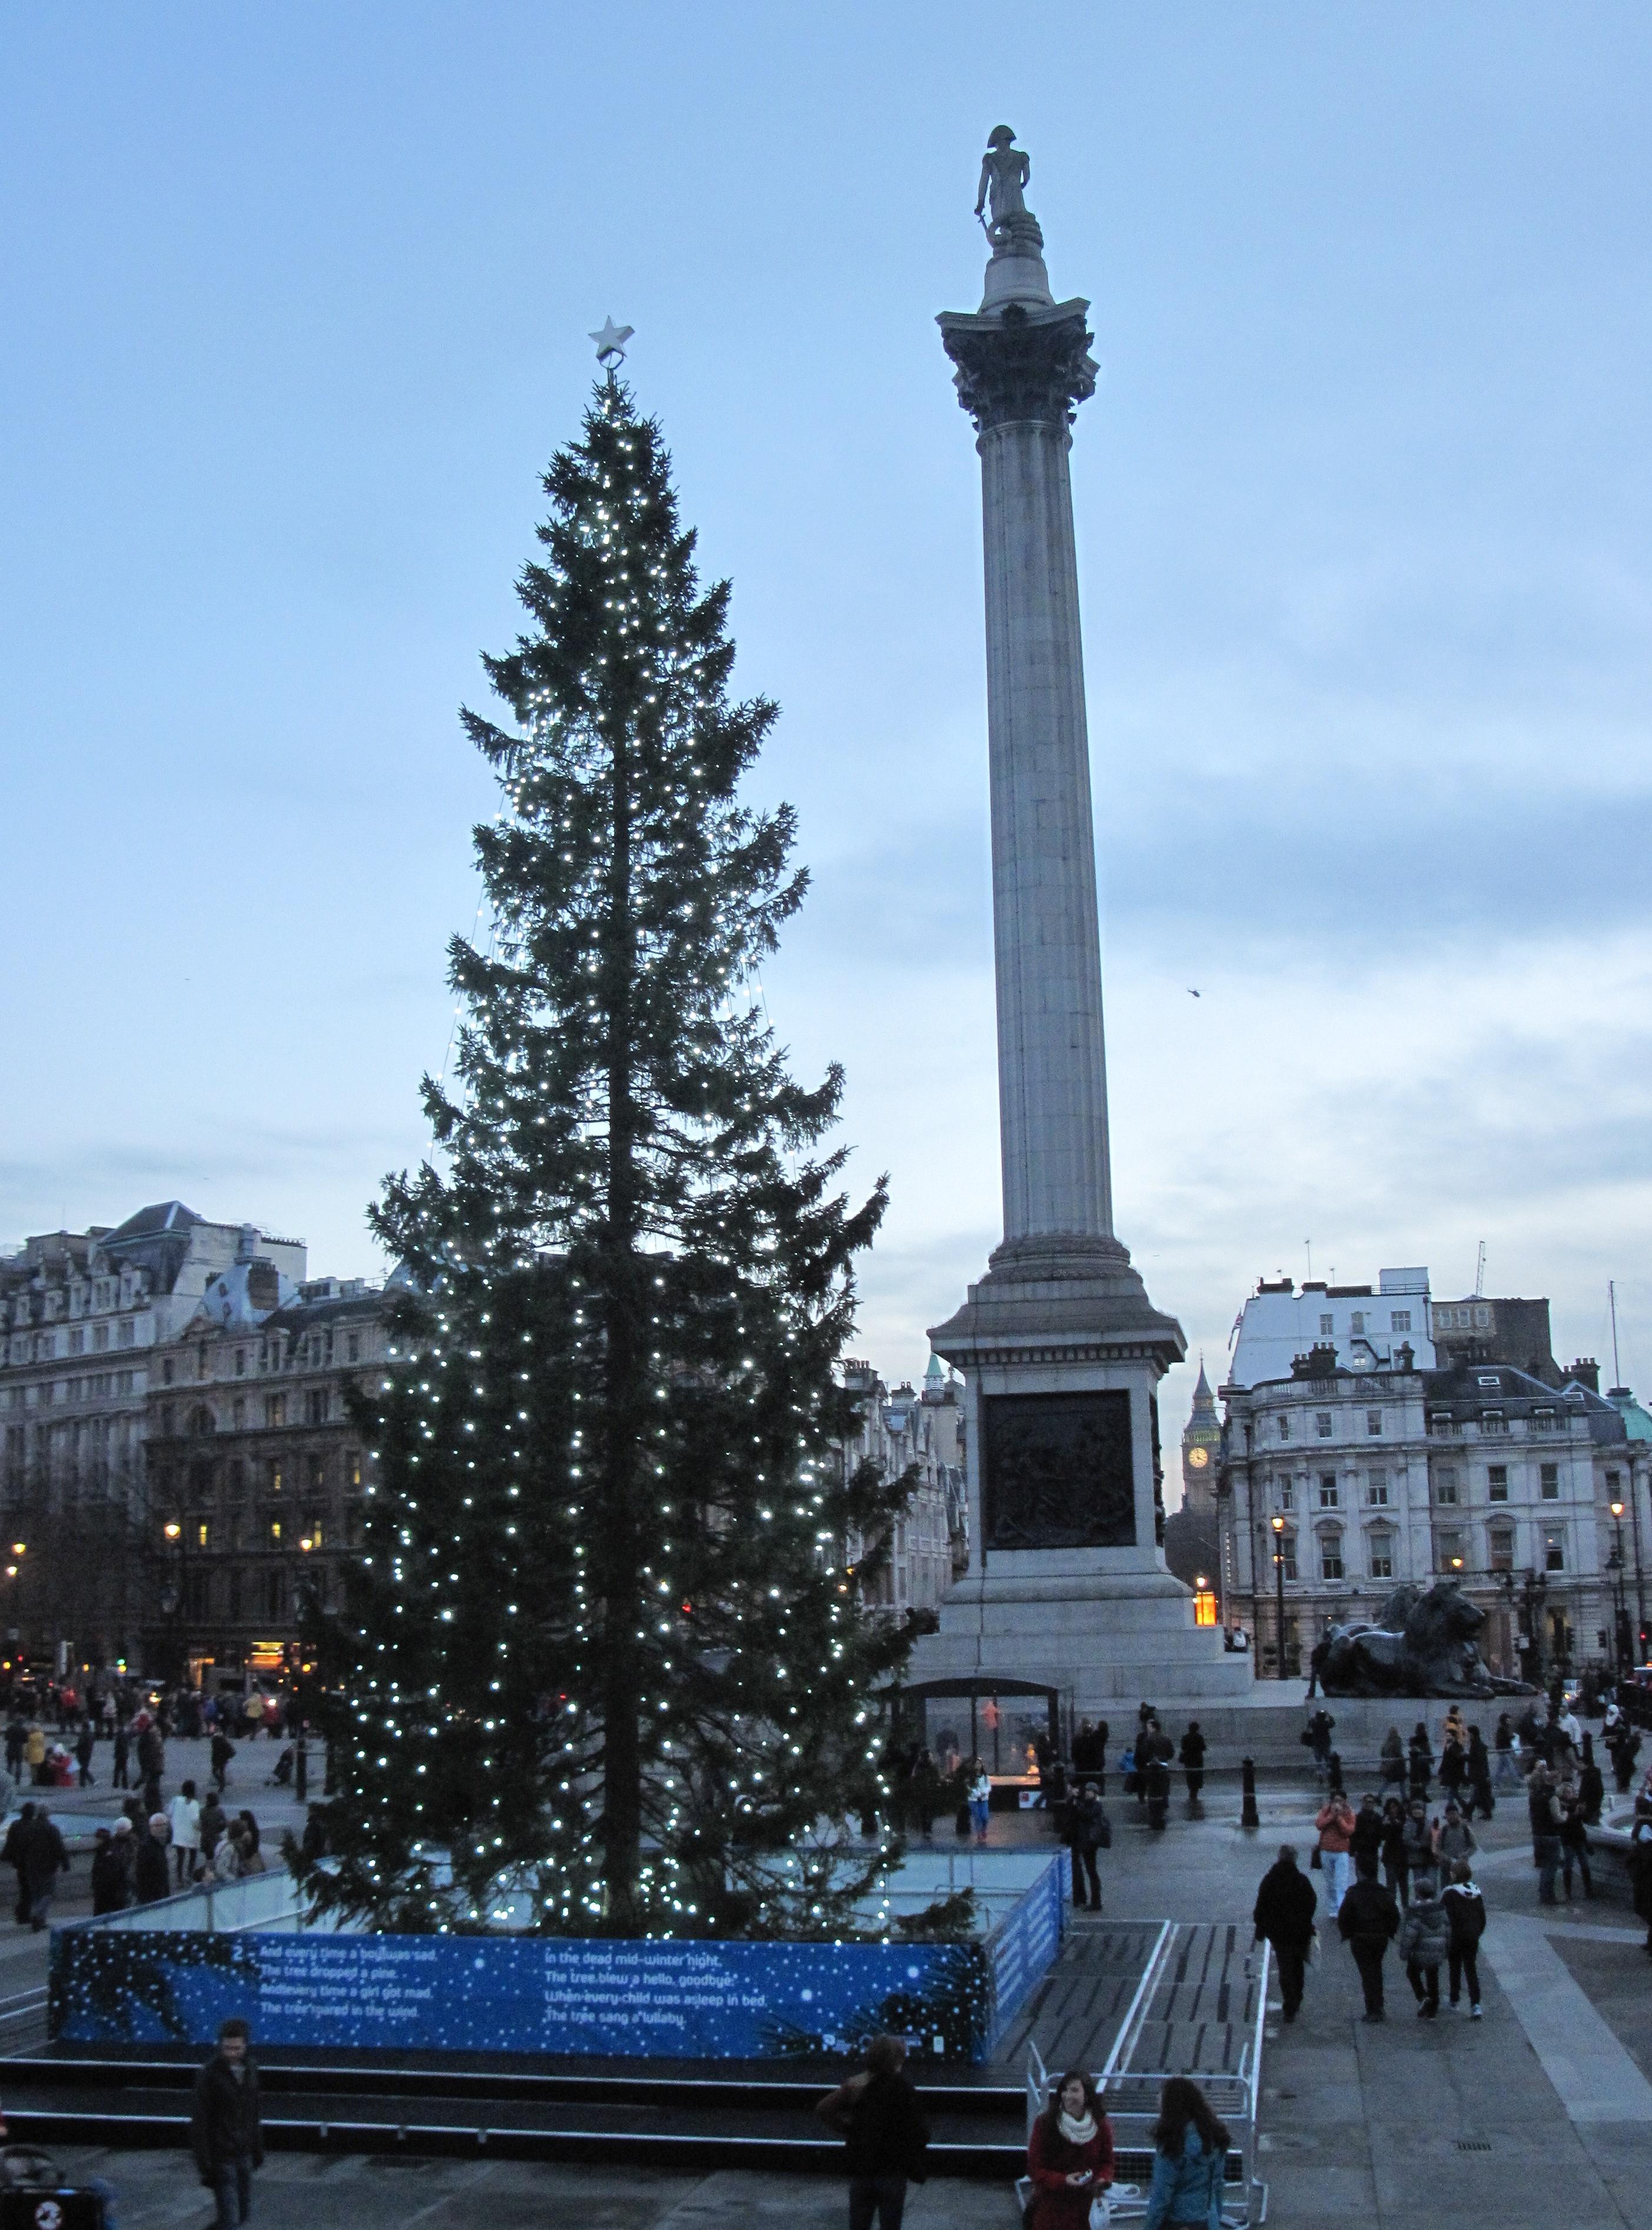 File:Christmas tree London 2012 08.jpg